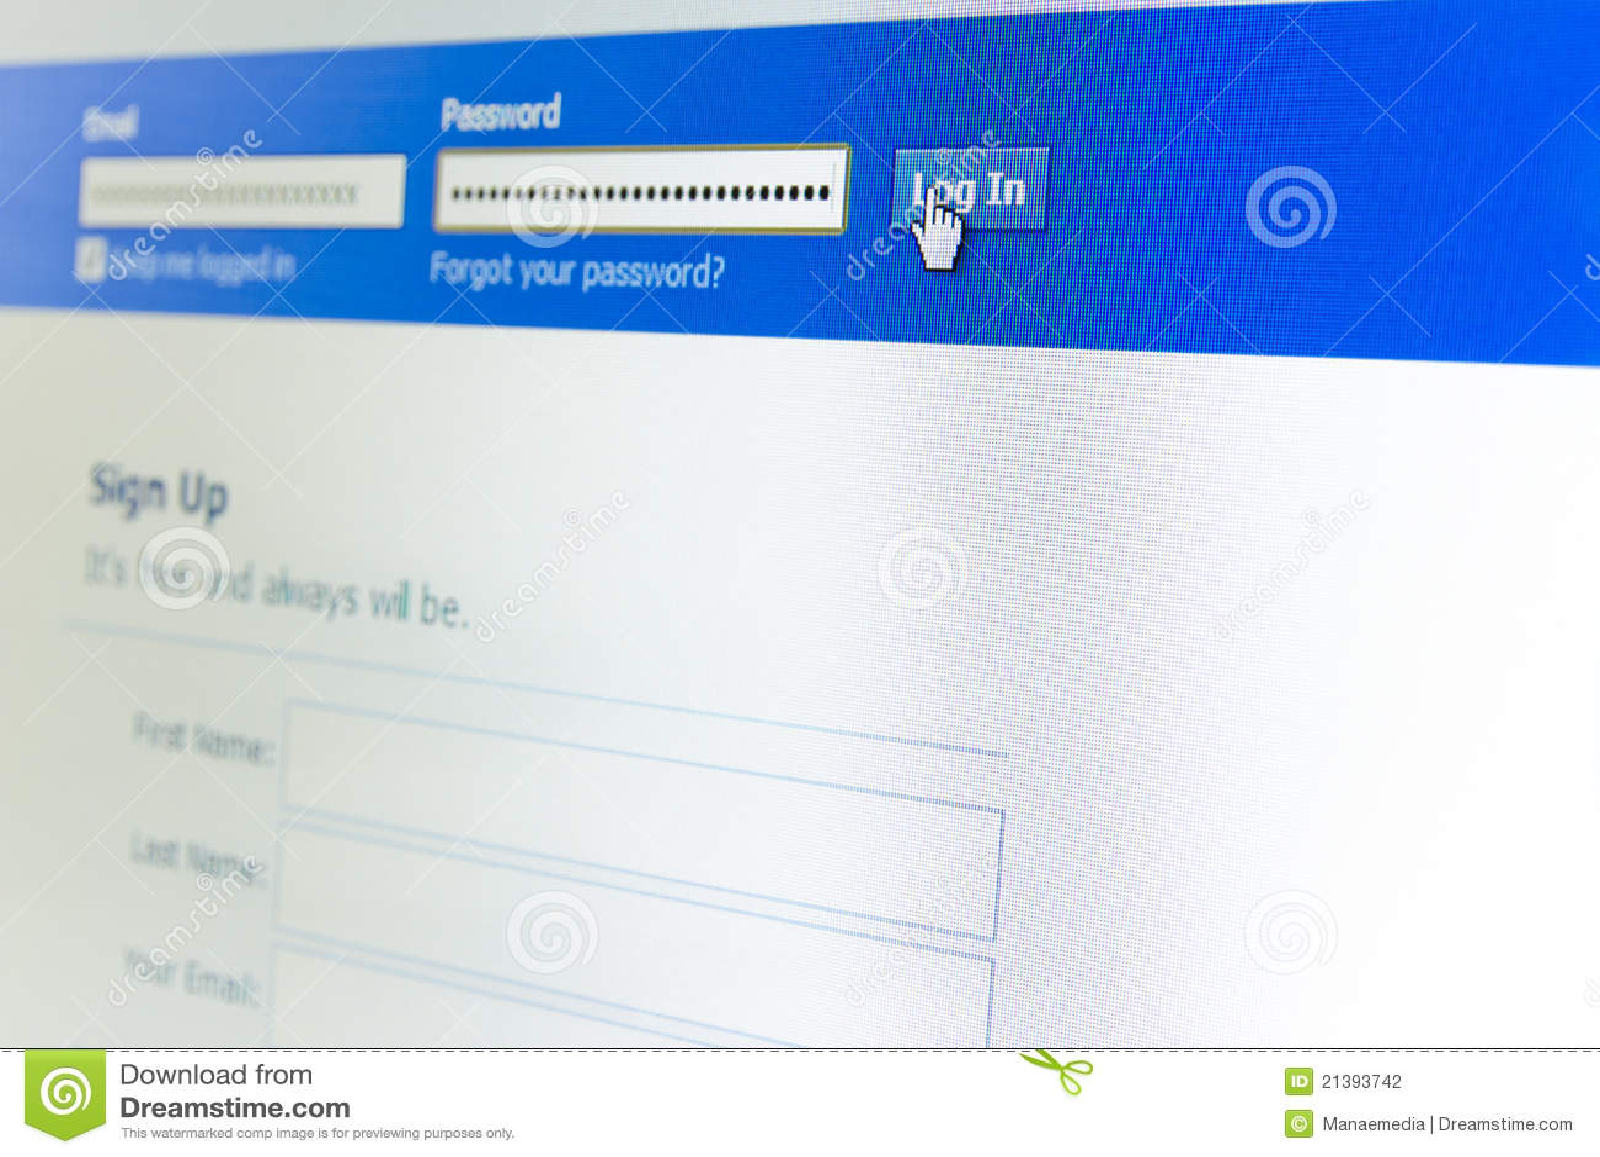 Www facebook login desktop